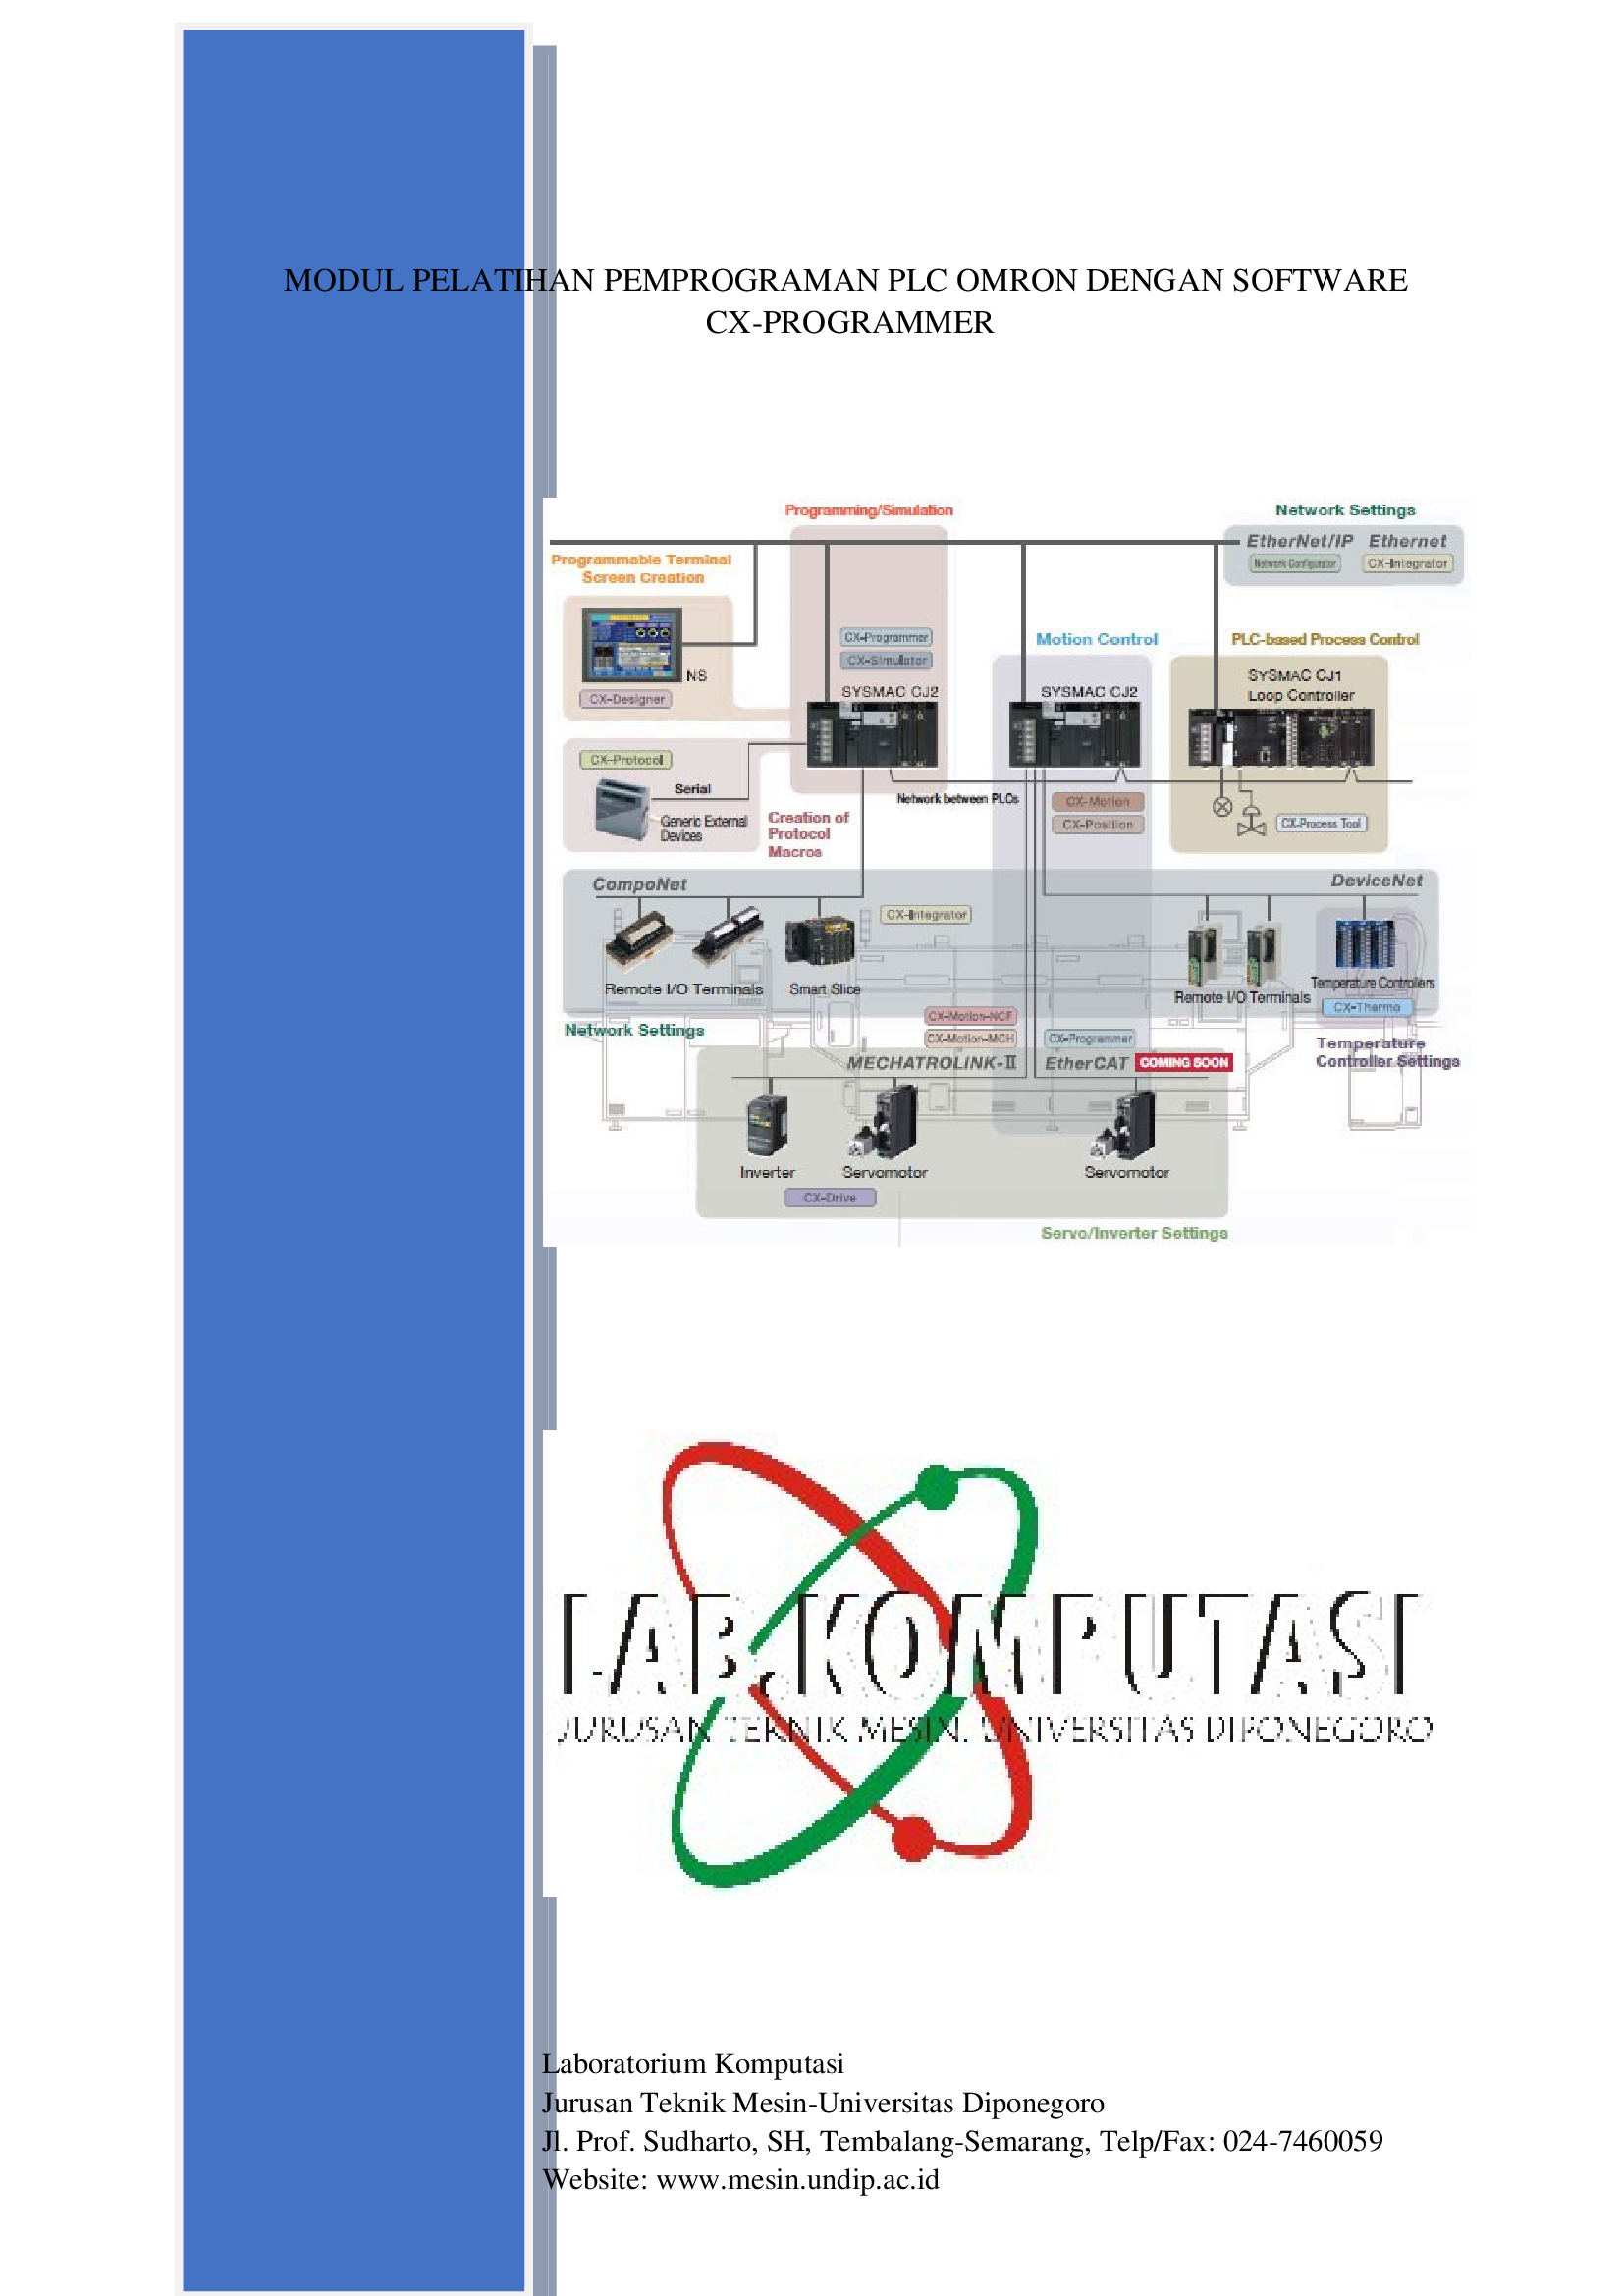 MODUL PELATIHAN PEMPROGRAMAN PLC OMRON DENGAN SOFTWARE CX-PROGRAMMER